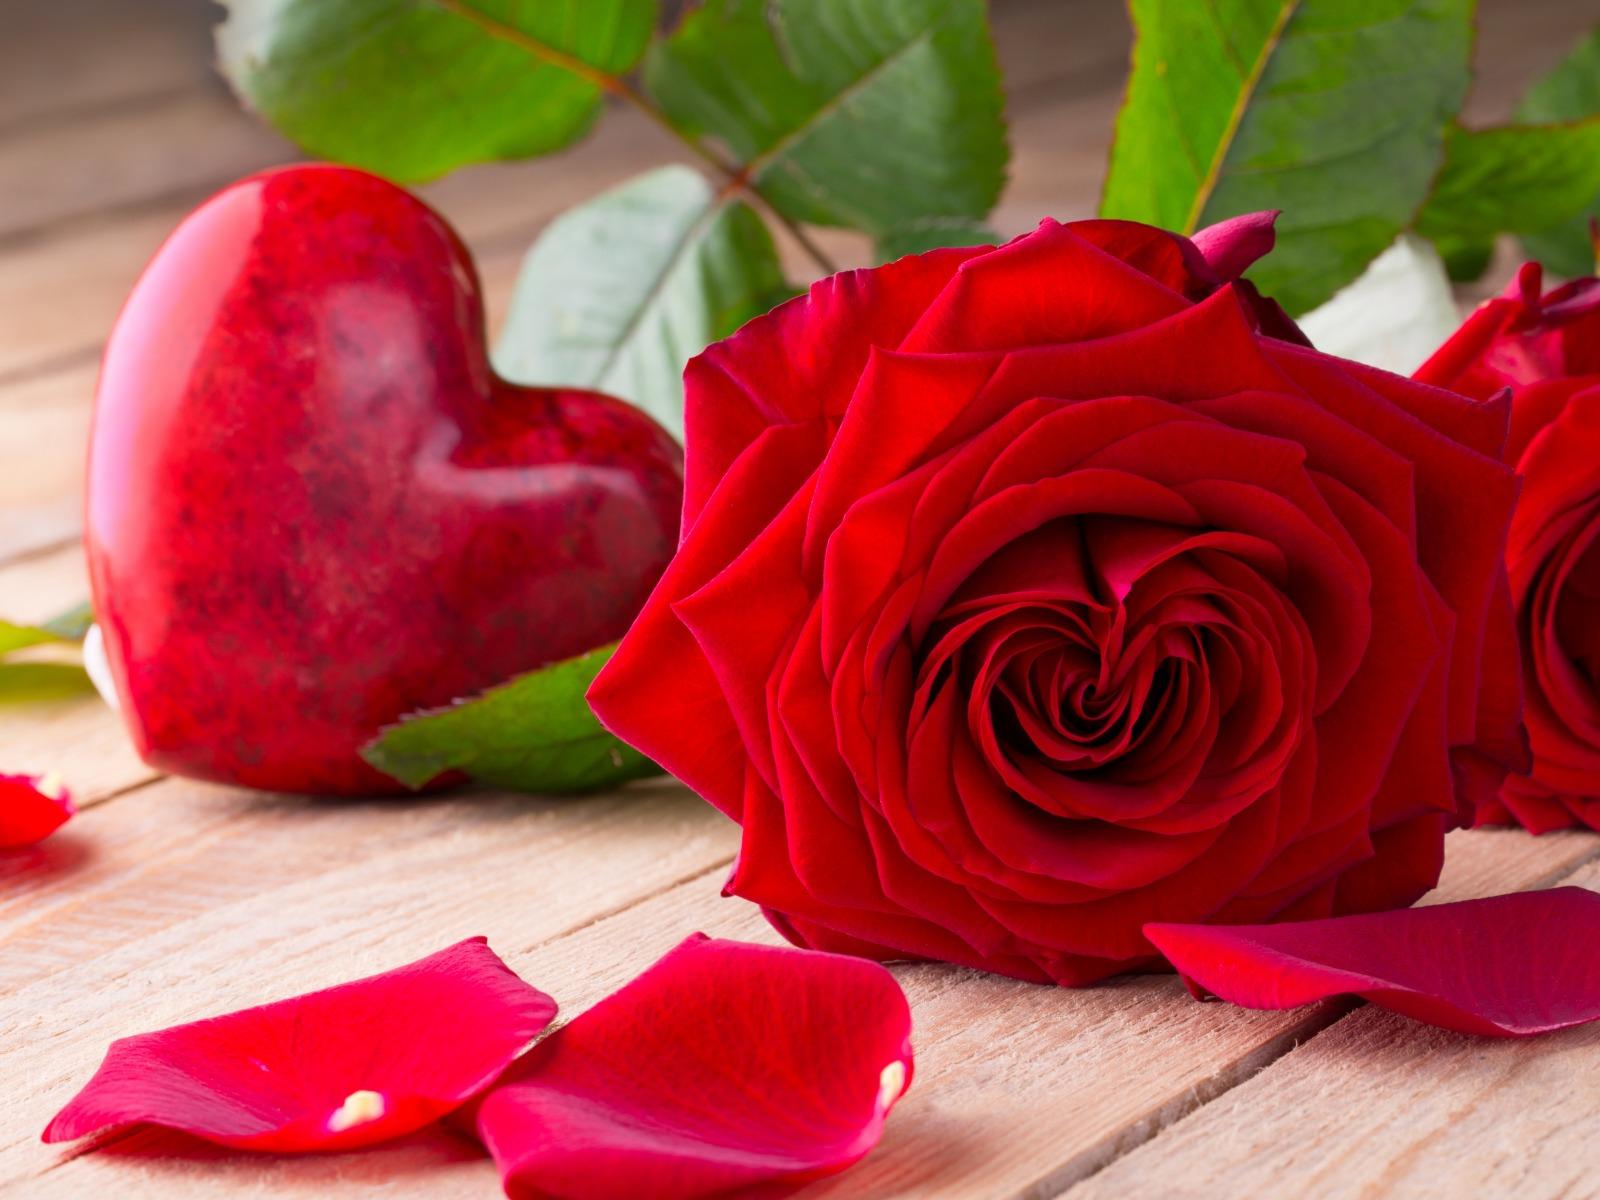 صوره صور الورد , صور ورود جميله ومختلفه